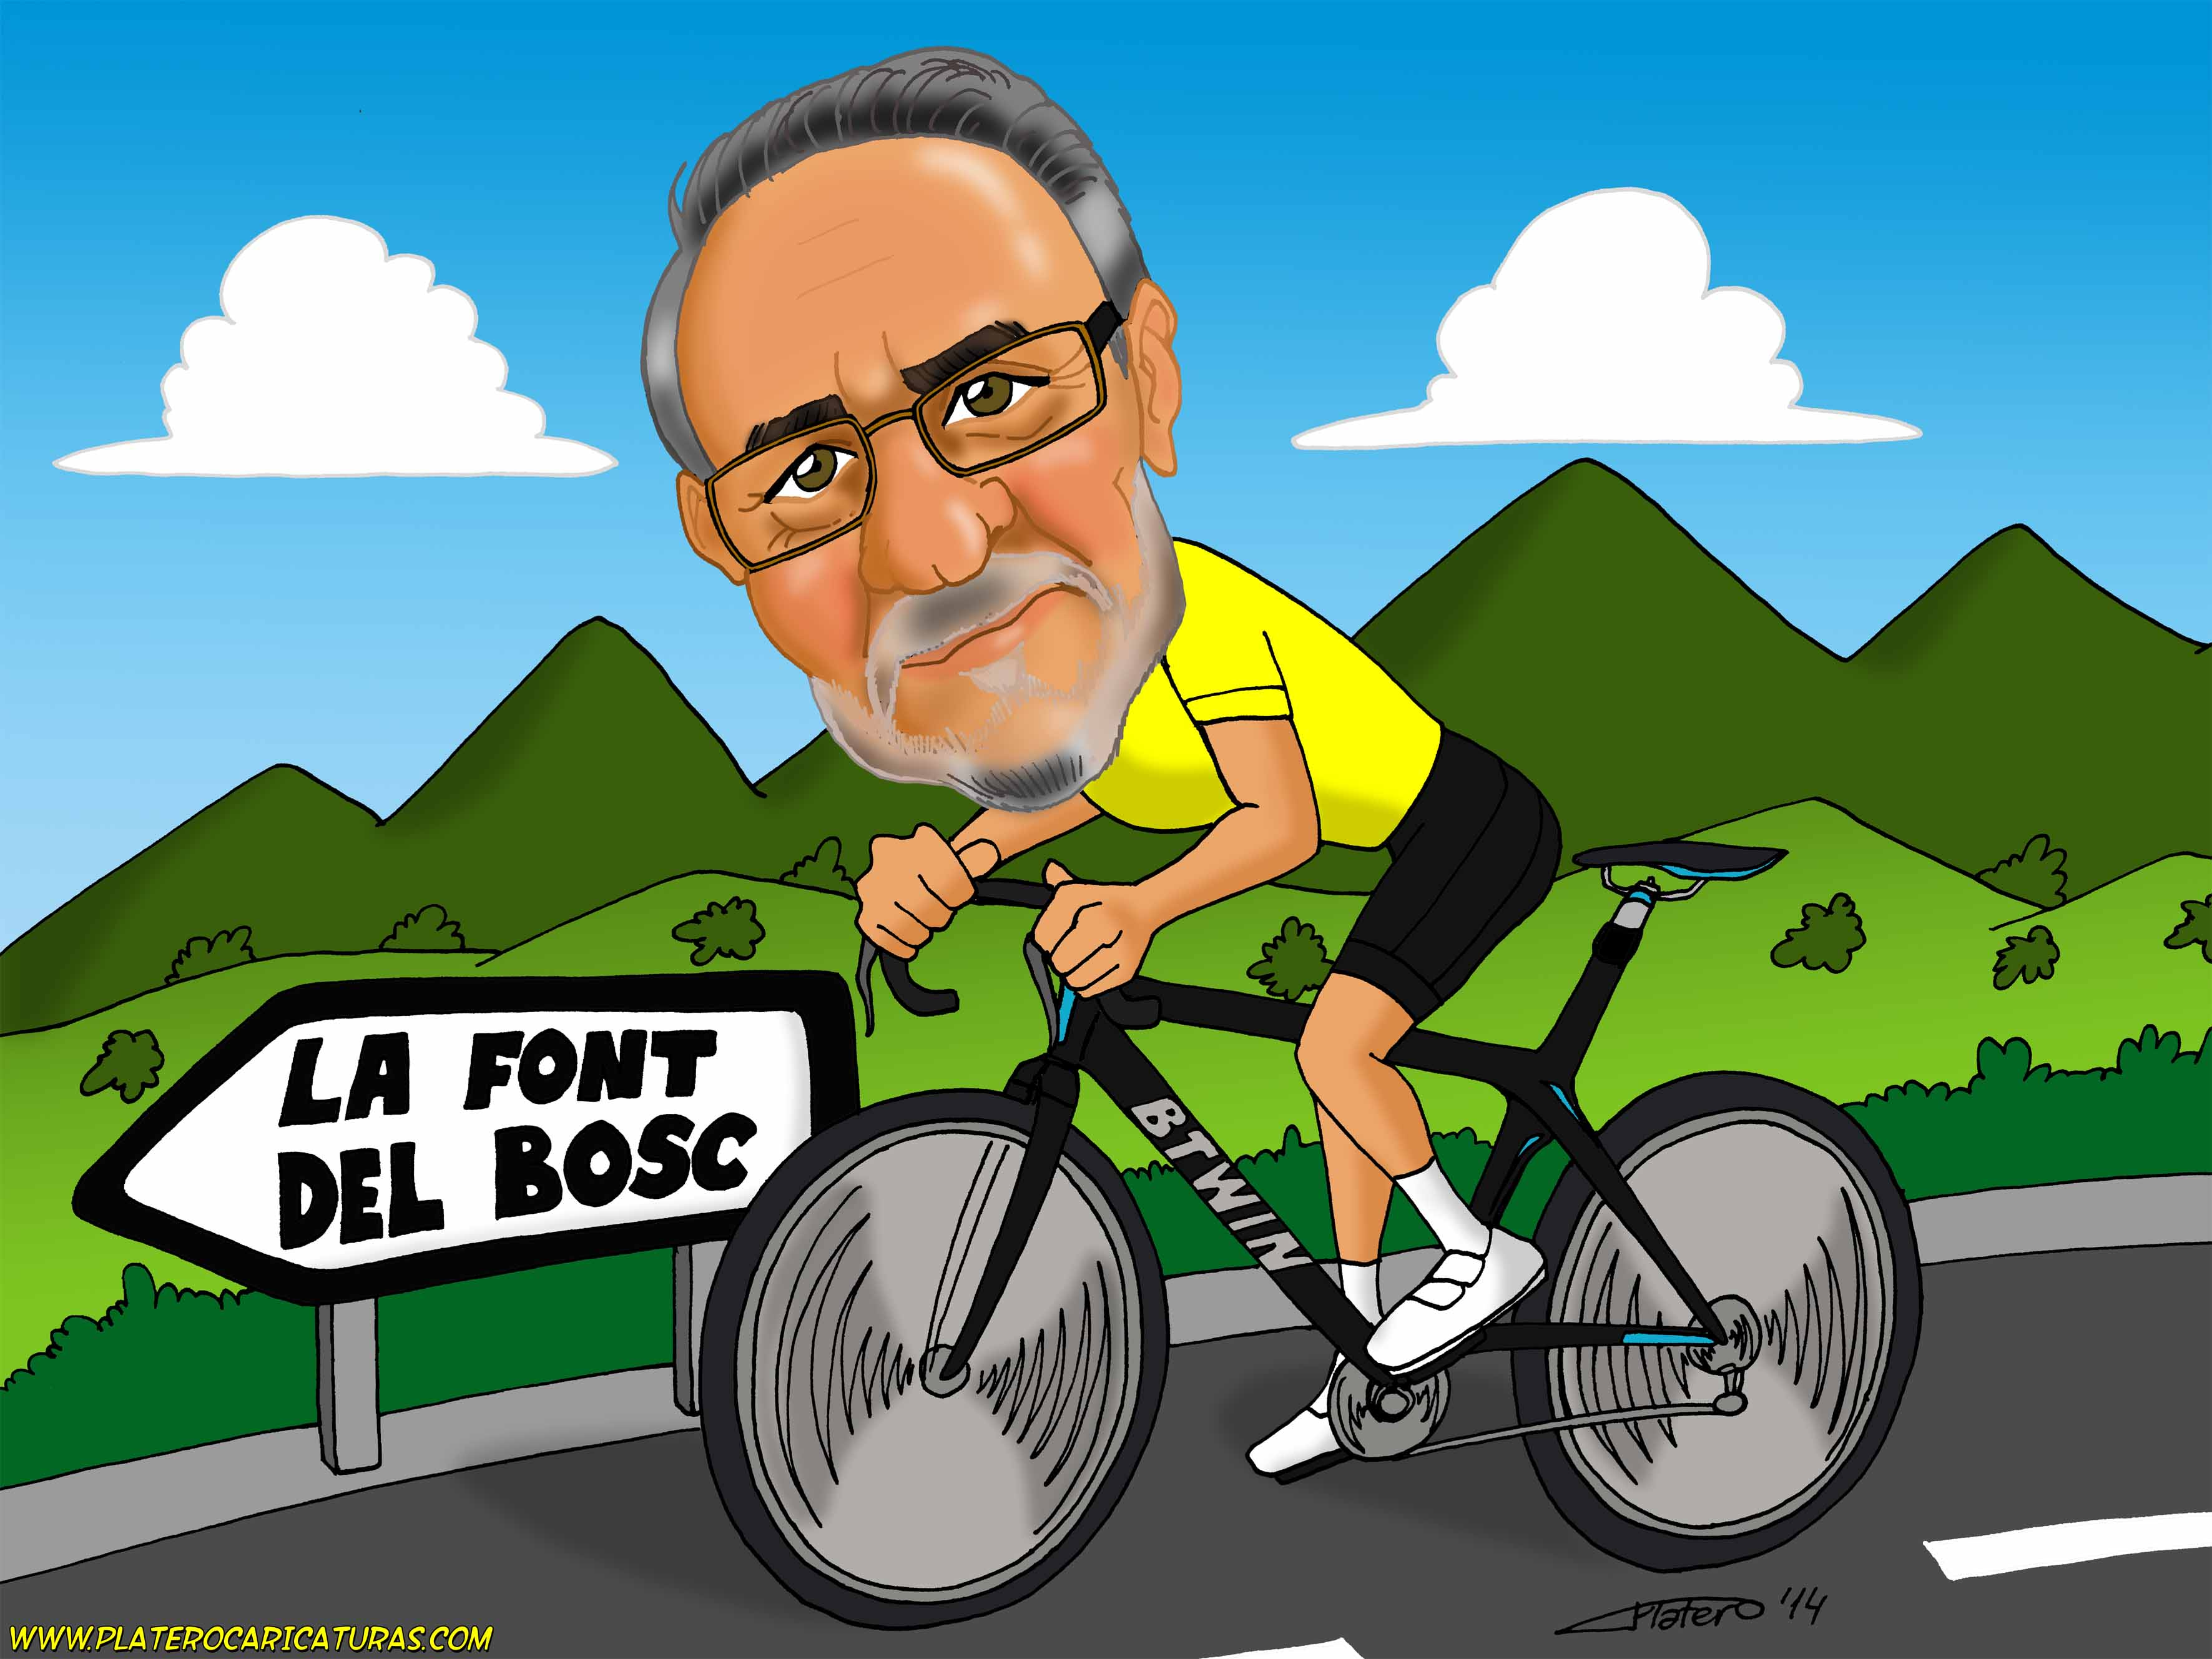 caricaturas a color por encargo personalizadas_ciclista bici carretera_plateroca